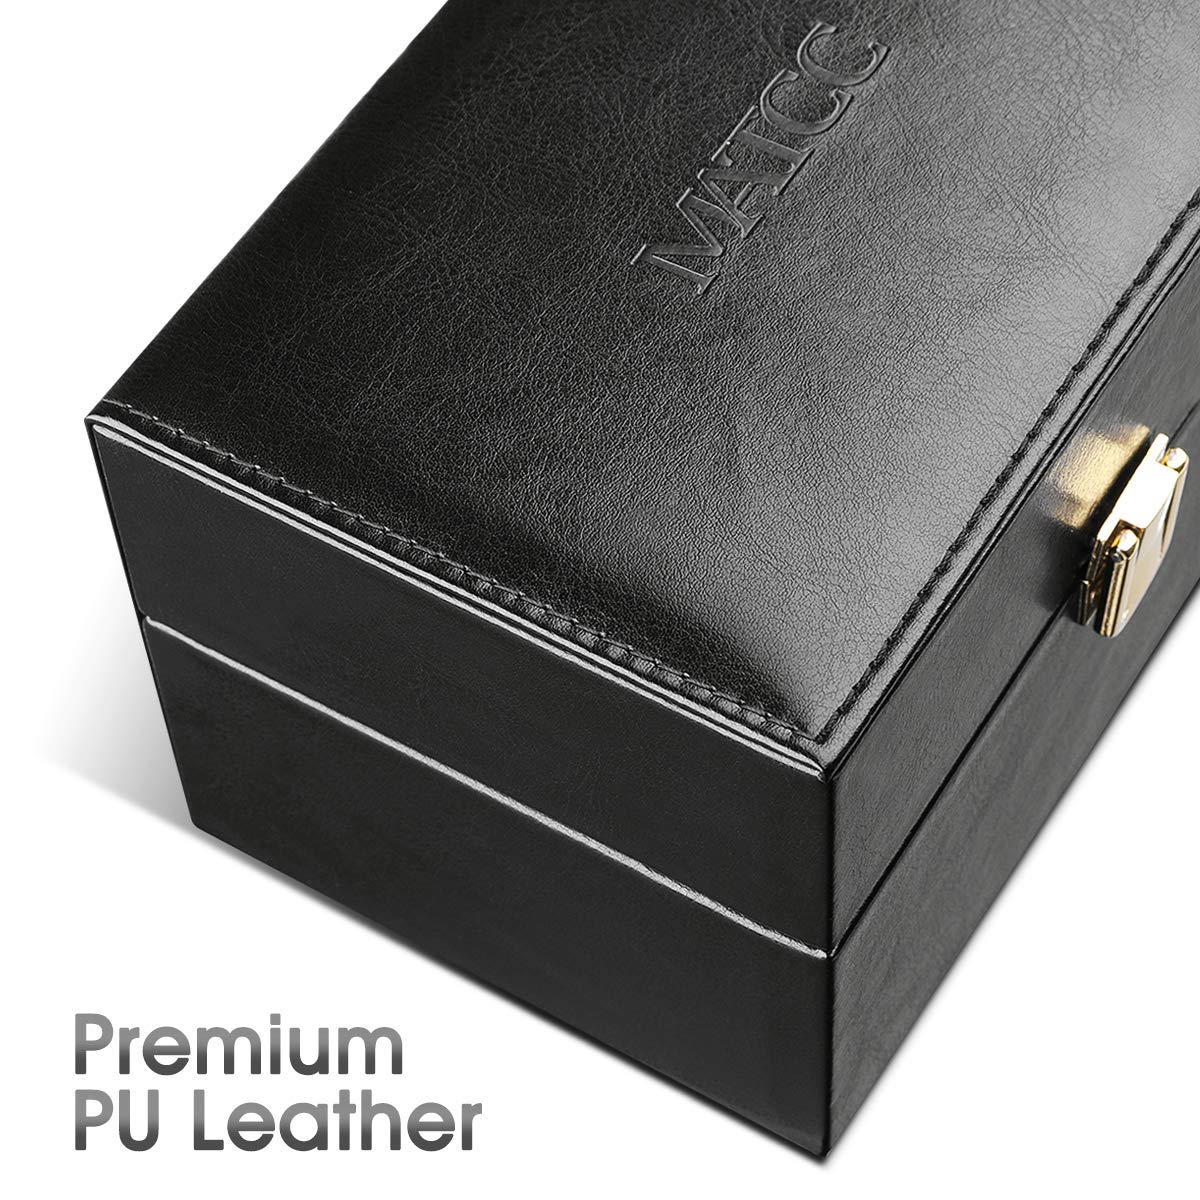 MATCC Car Signal Blocker Box Faraday Box for Car Keys Phones Bank Cards Bluetooth Signal Blocker Security Anti-Theft PU Leather Large Storage Box